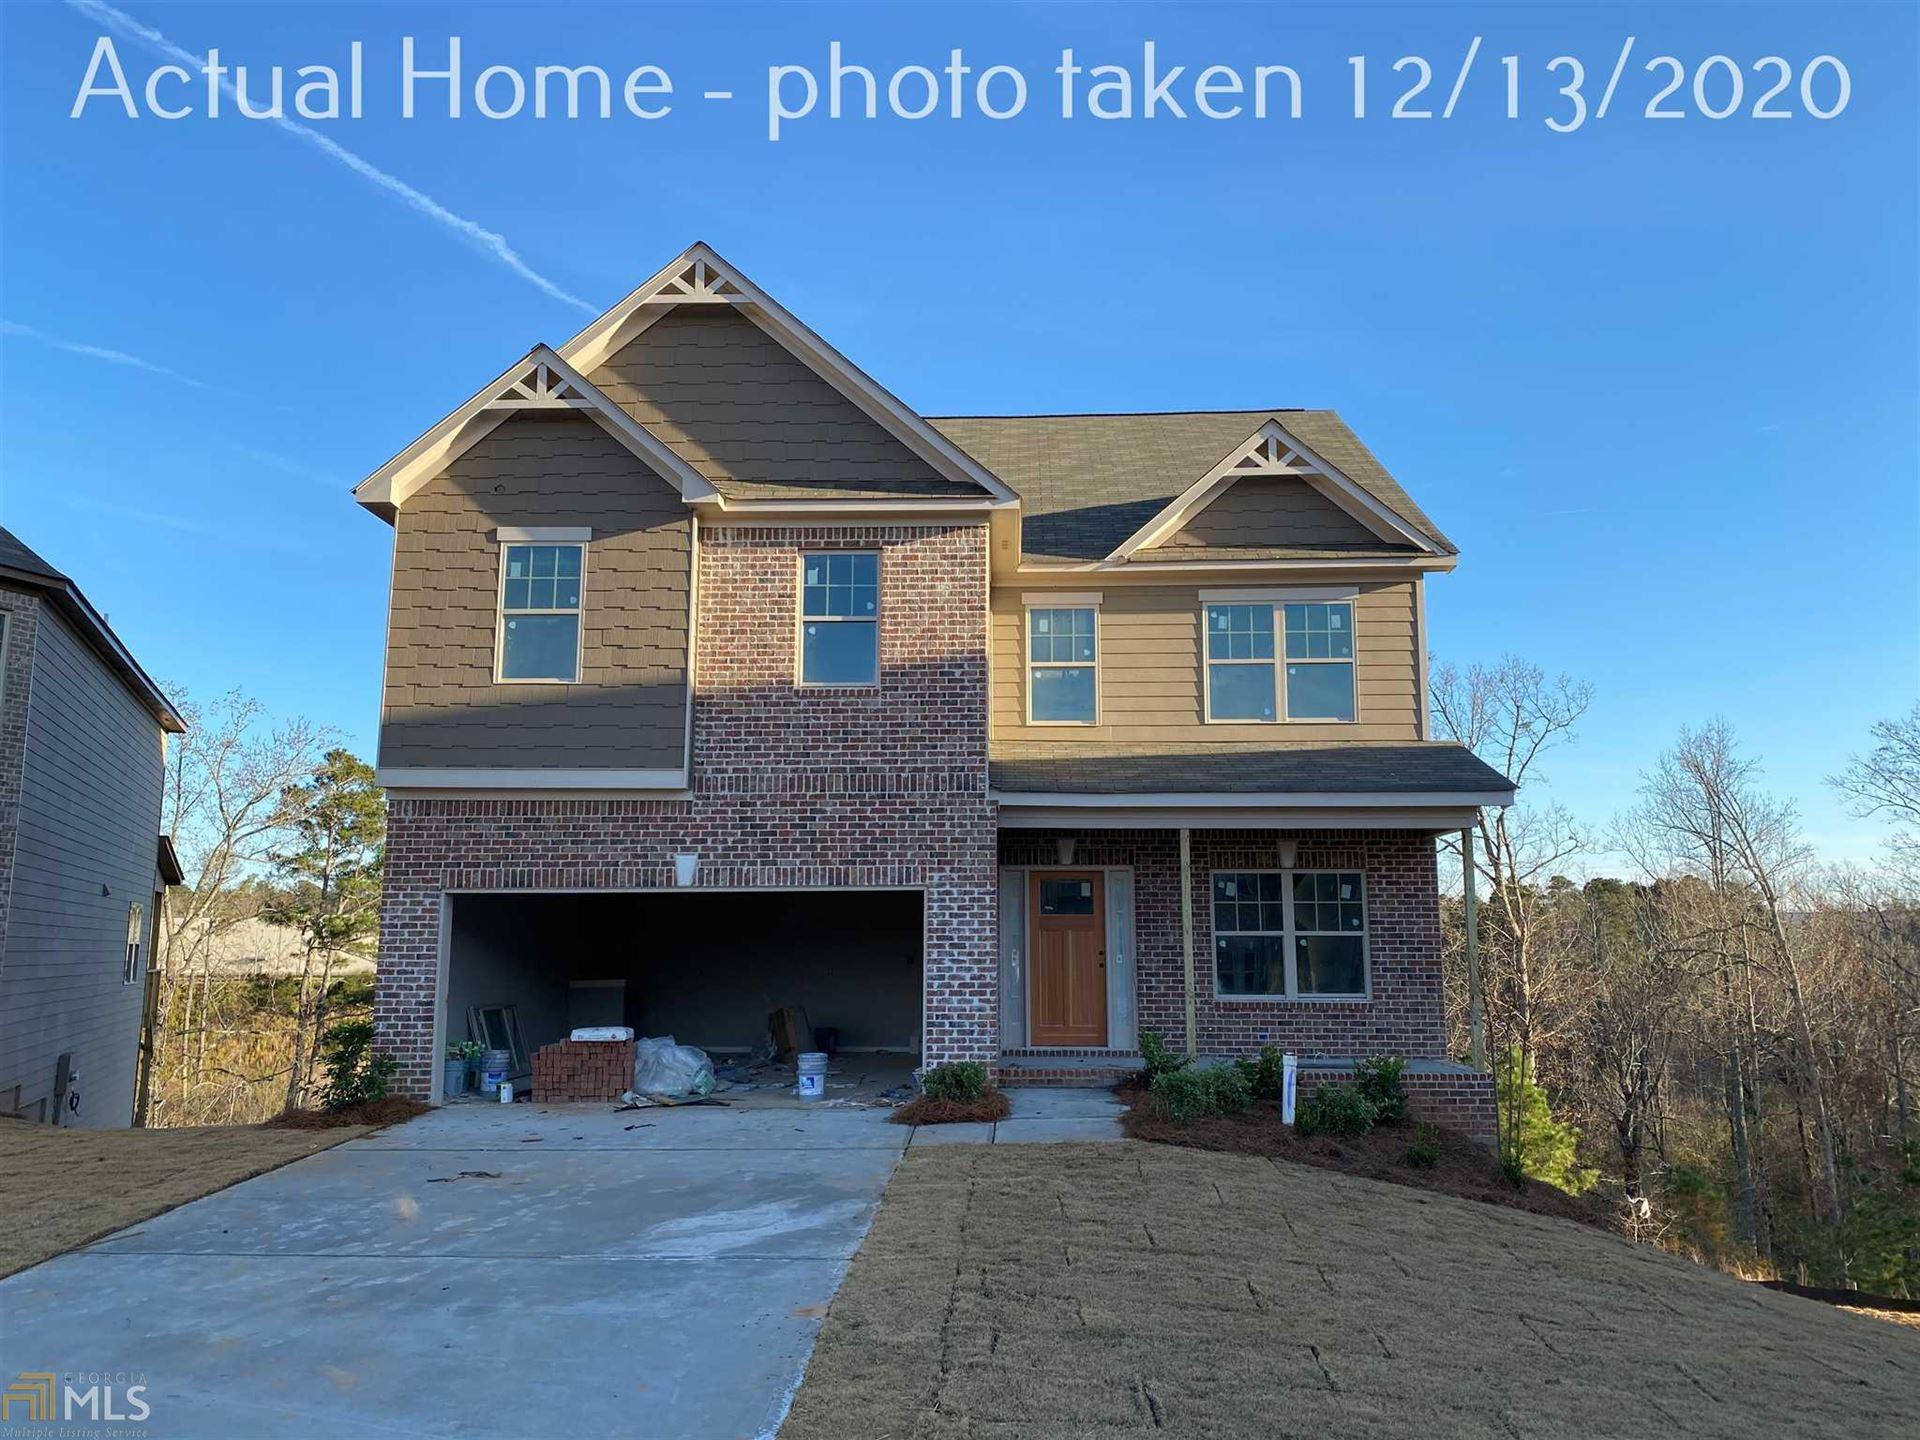 1586 Castleberry Ln, Buford, GA 30518 - MLS#: 8860584